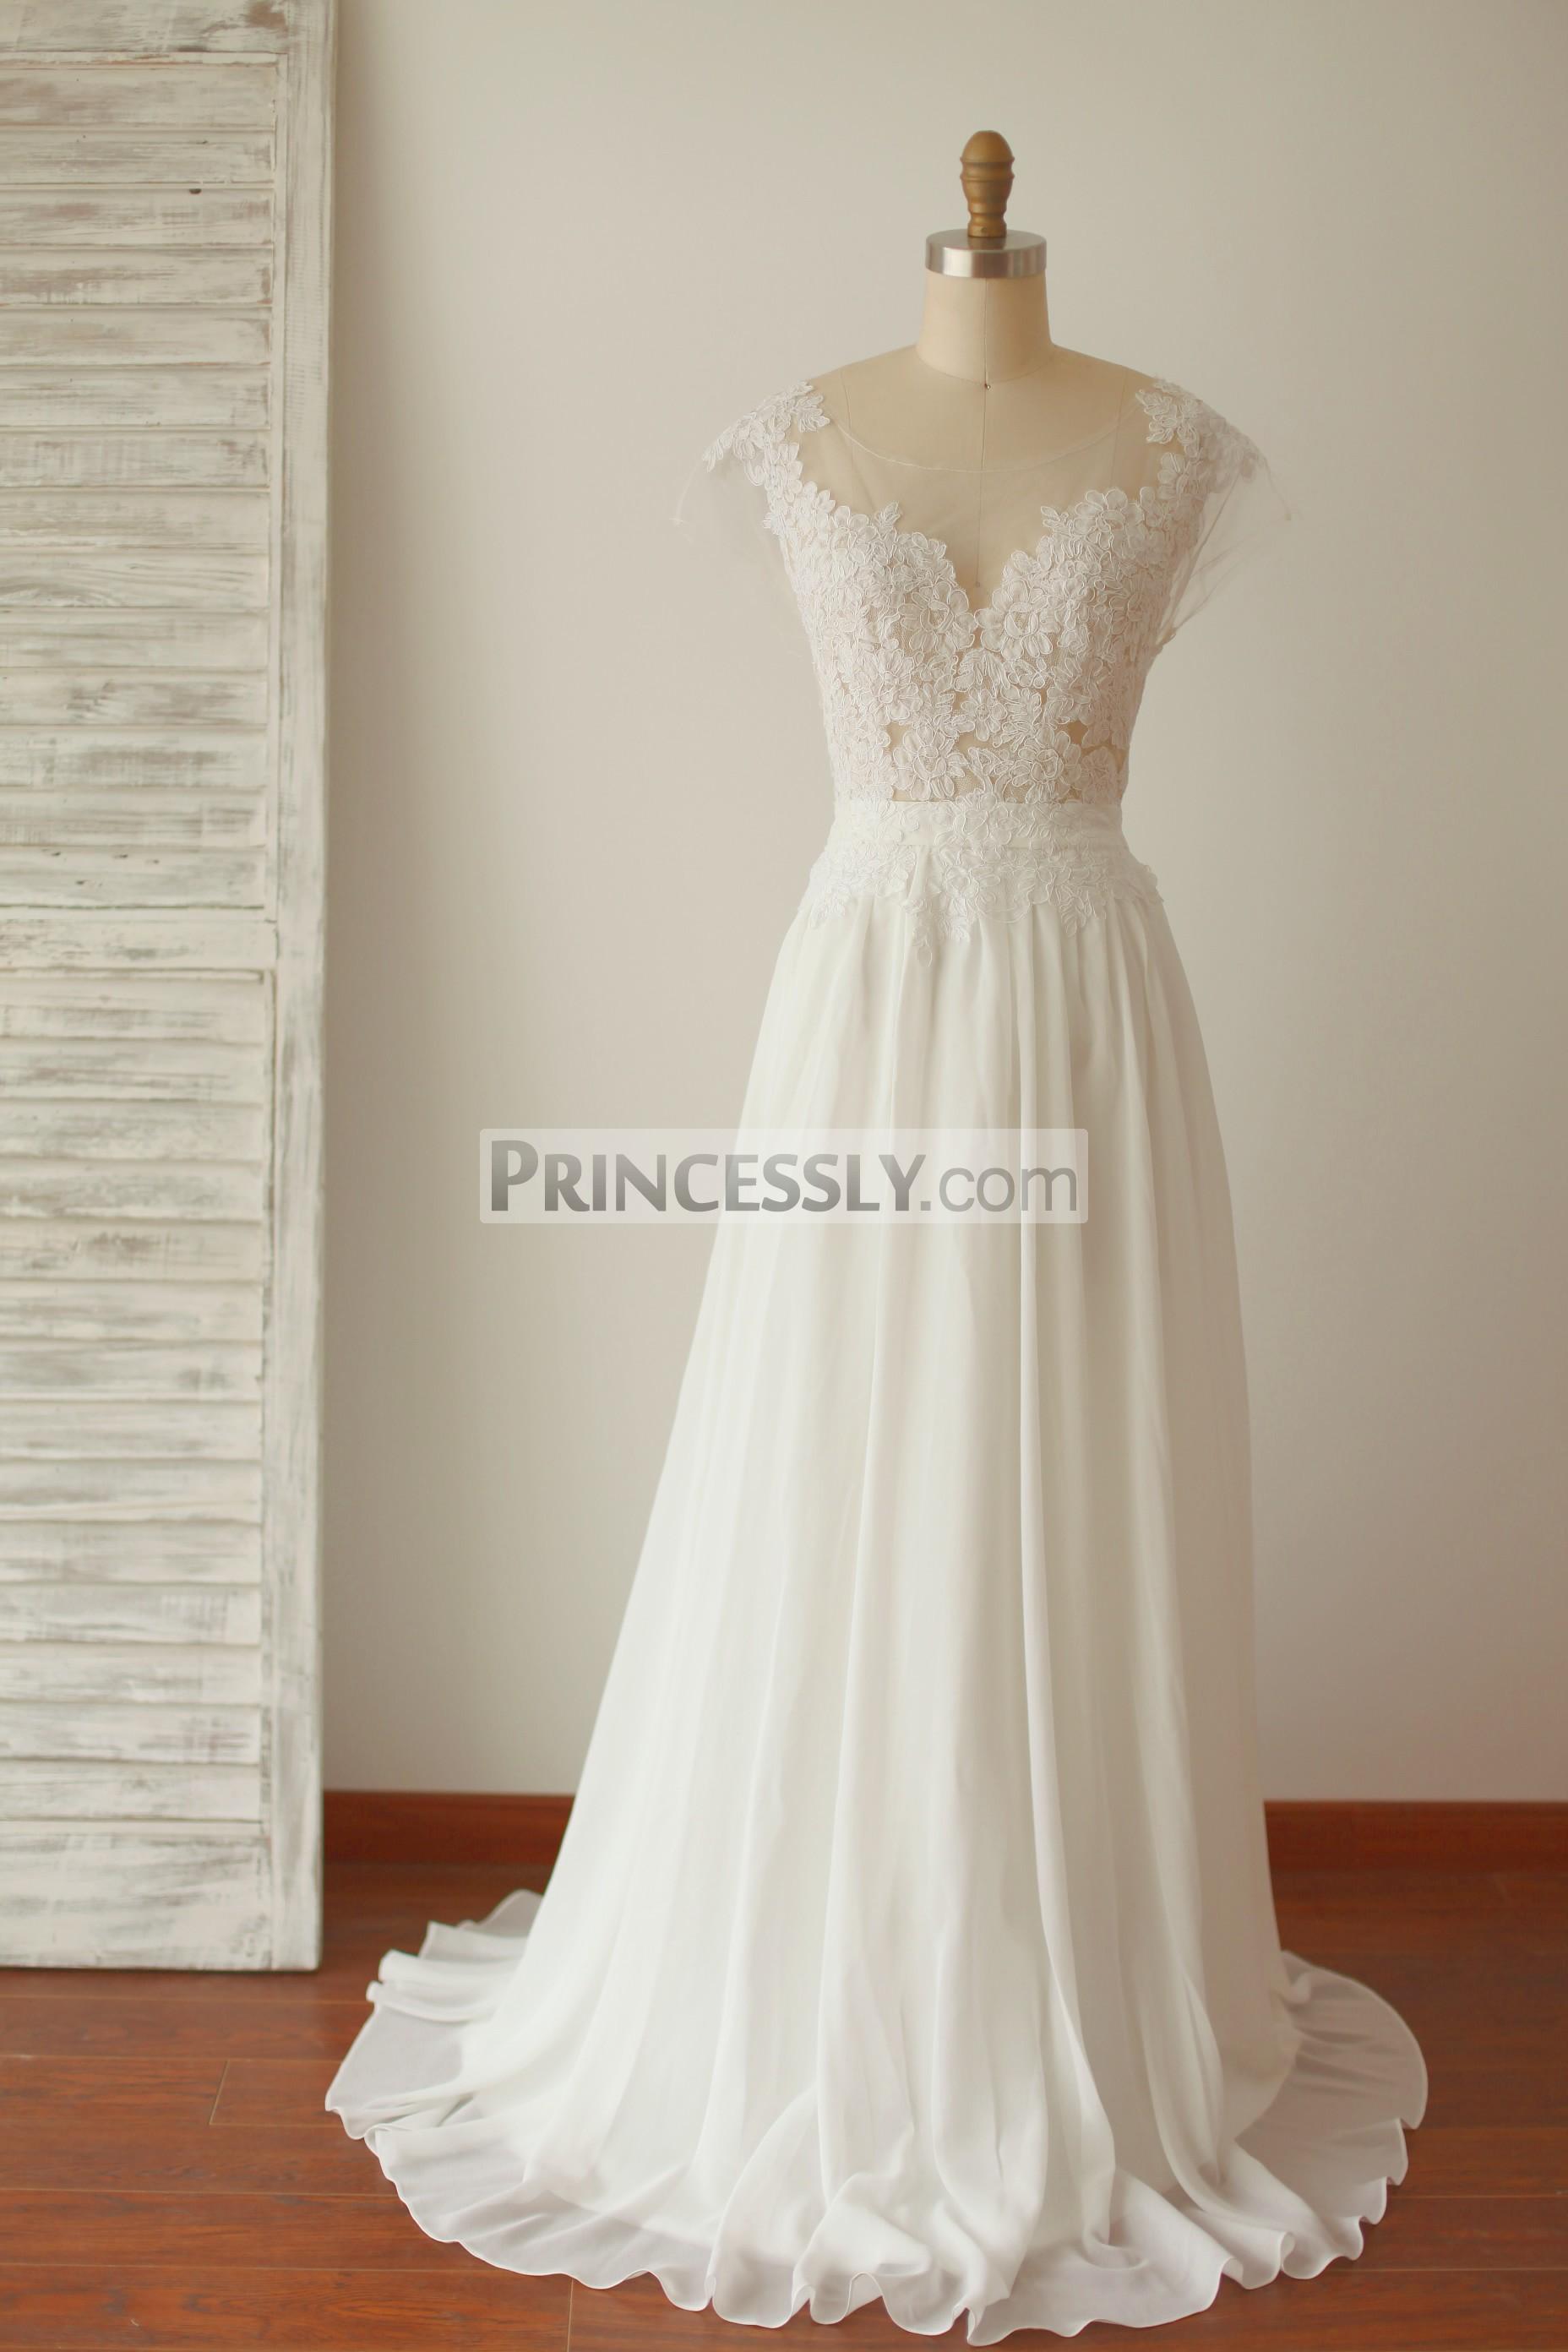 aliexpress wedding dresses review photo - 1